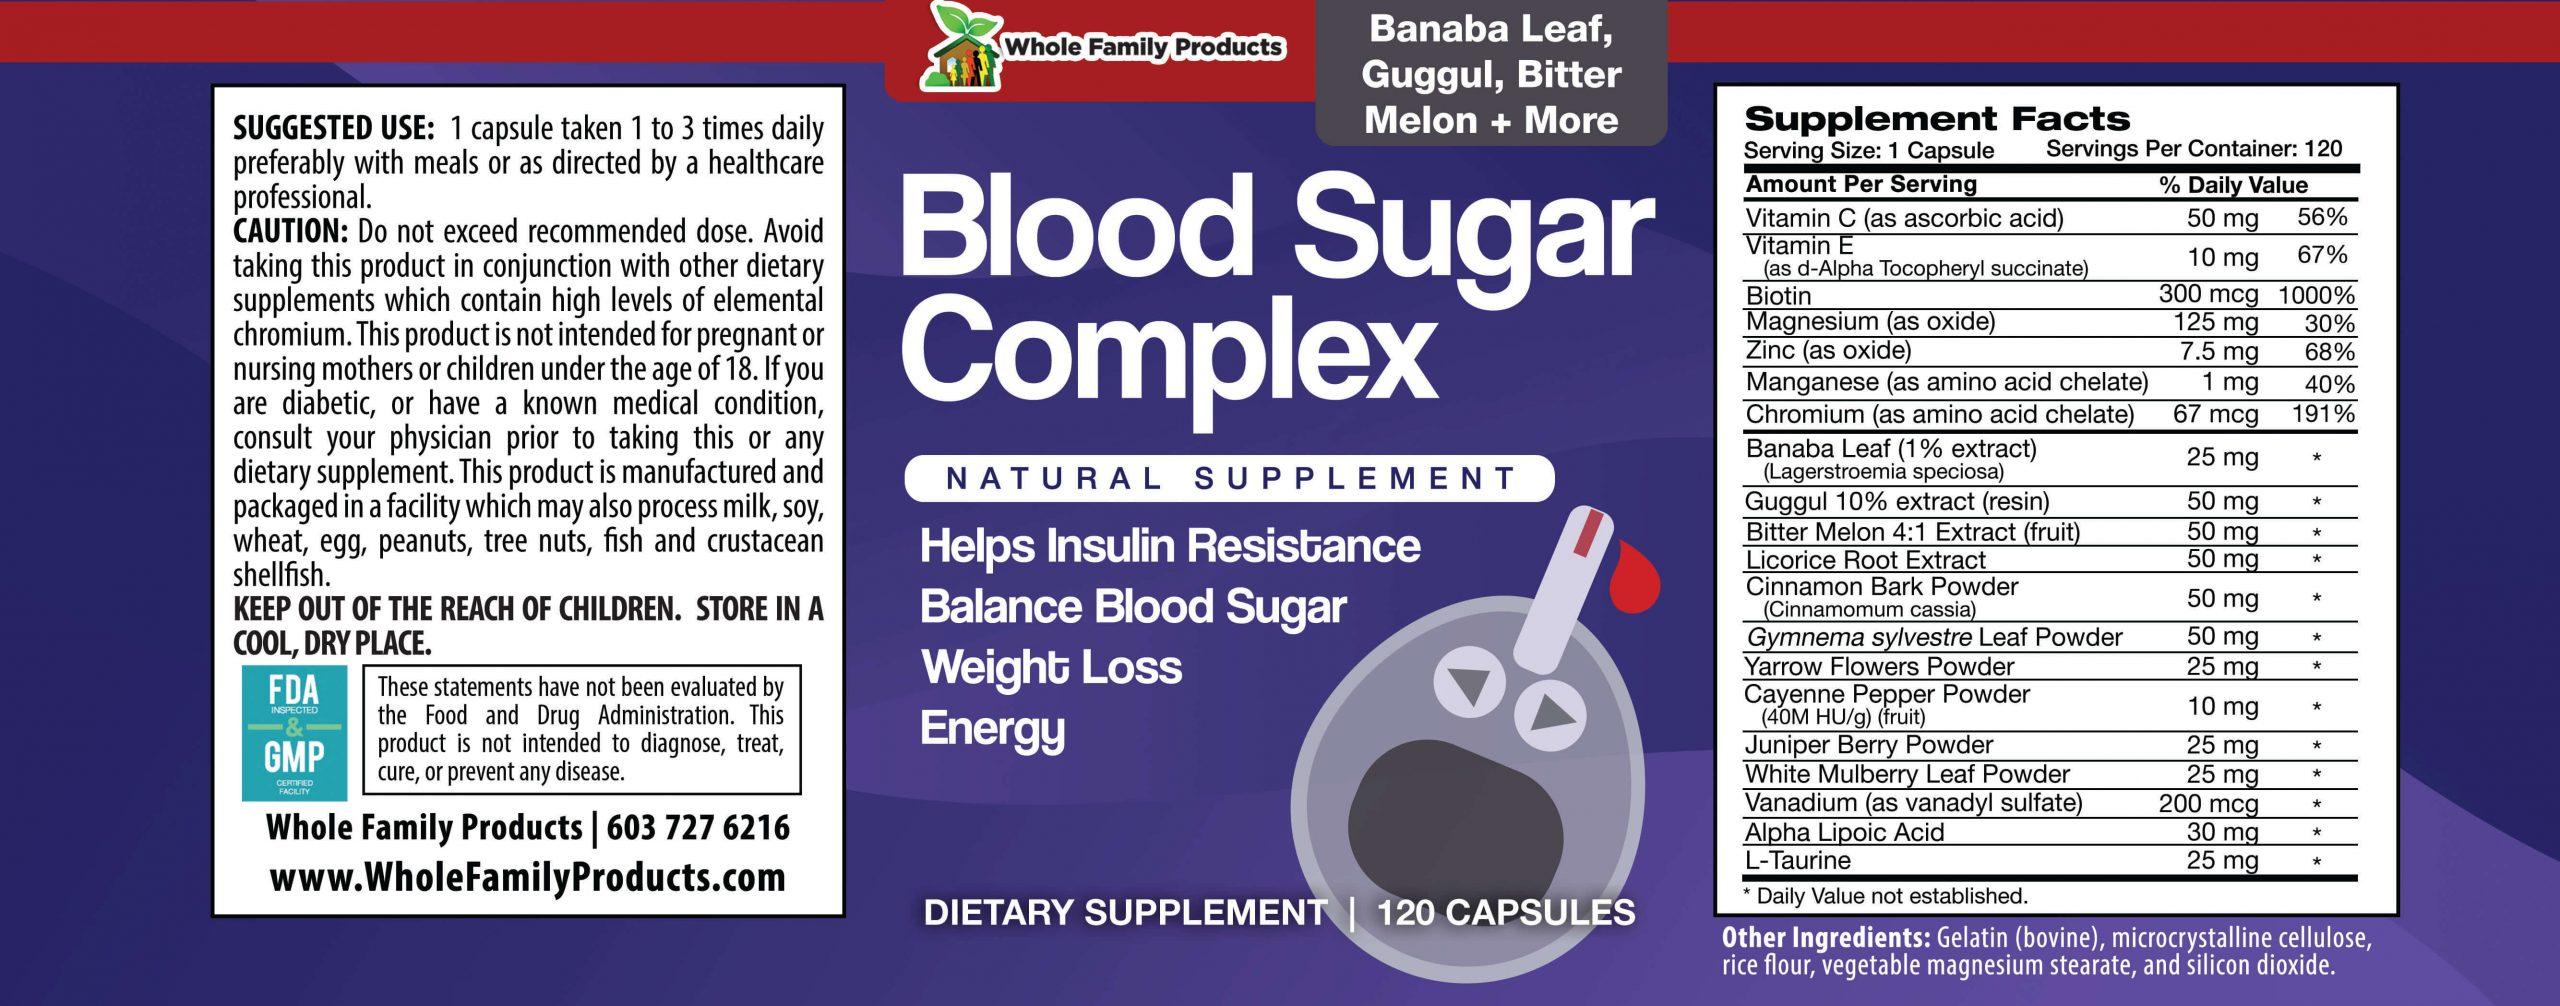 Blood Sugar Complex 120 Capsules Product Label.jpg